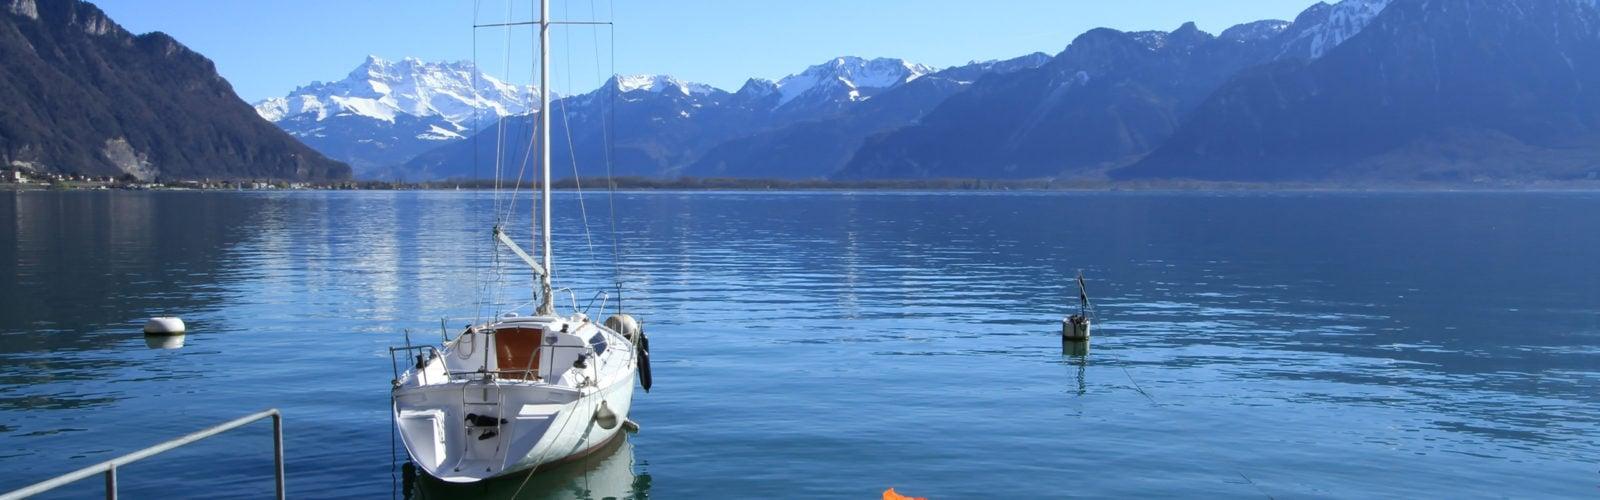 lake-geneva-montreux-boat